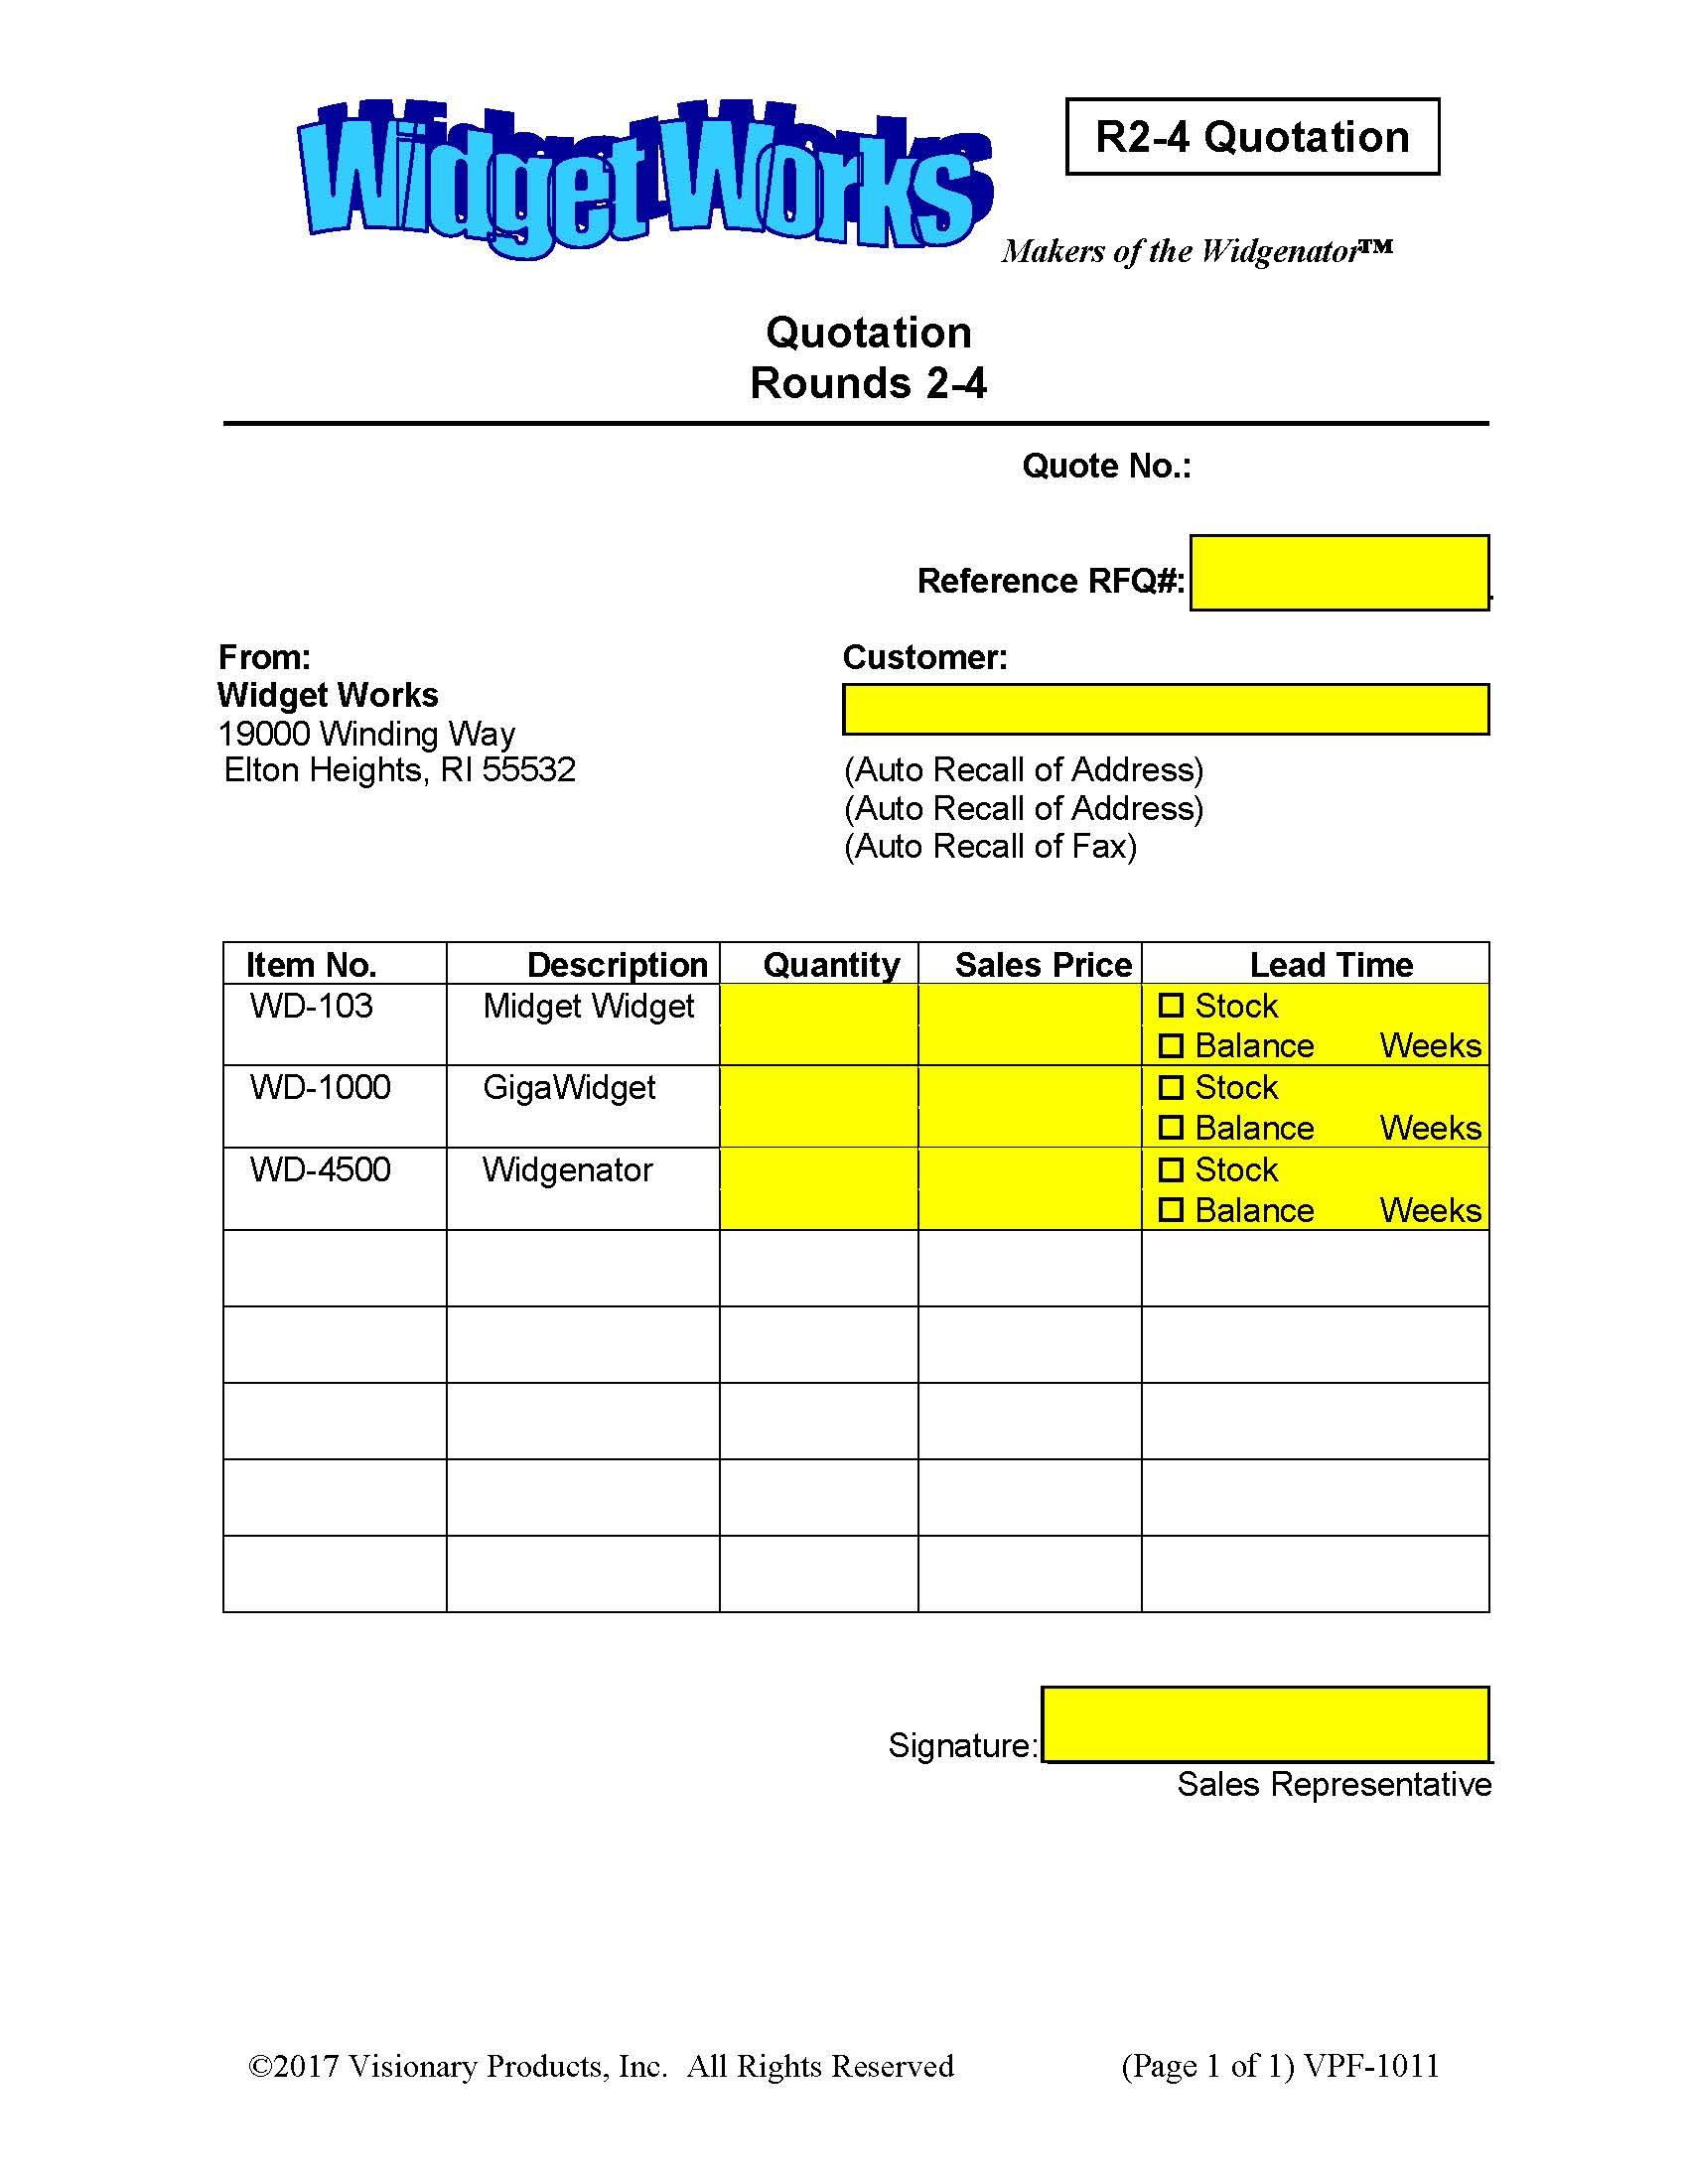 VPF-1011 Round 2-4 Quotation Forms.jpg